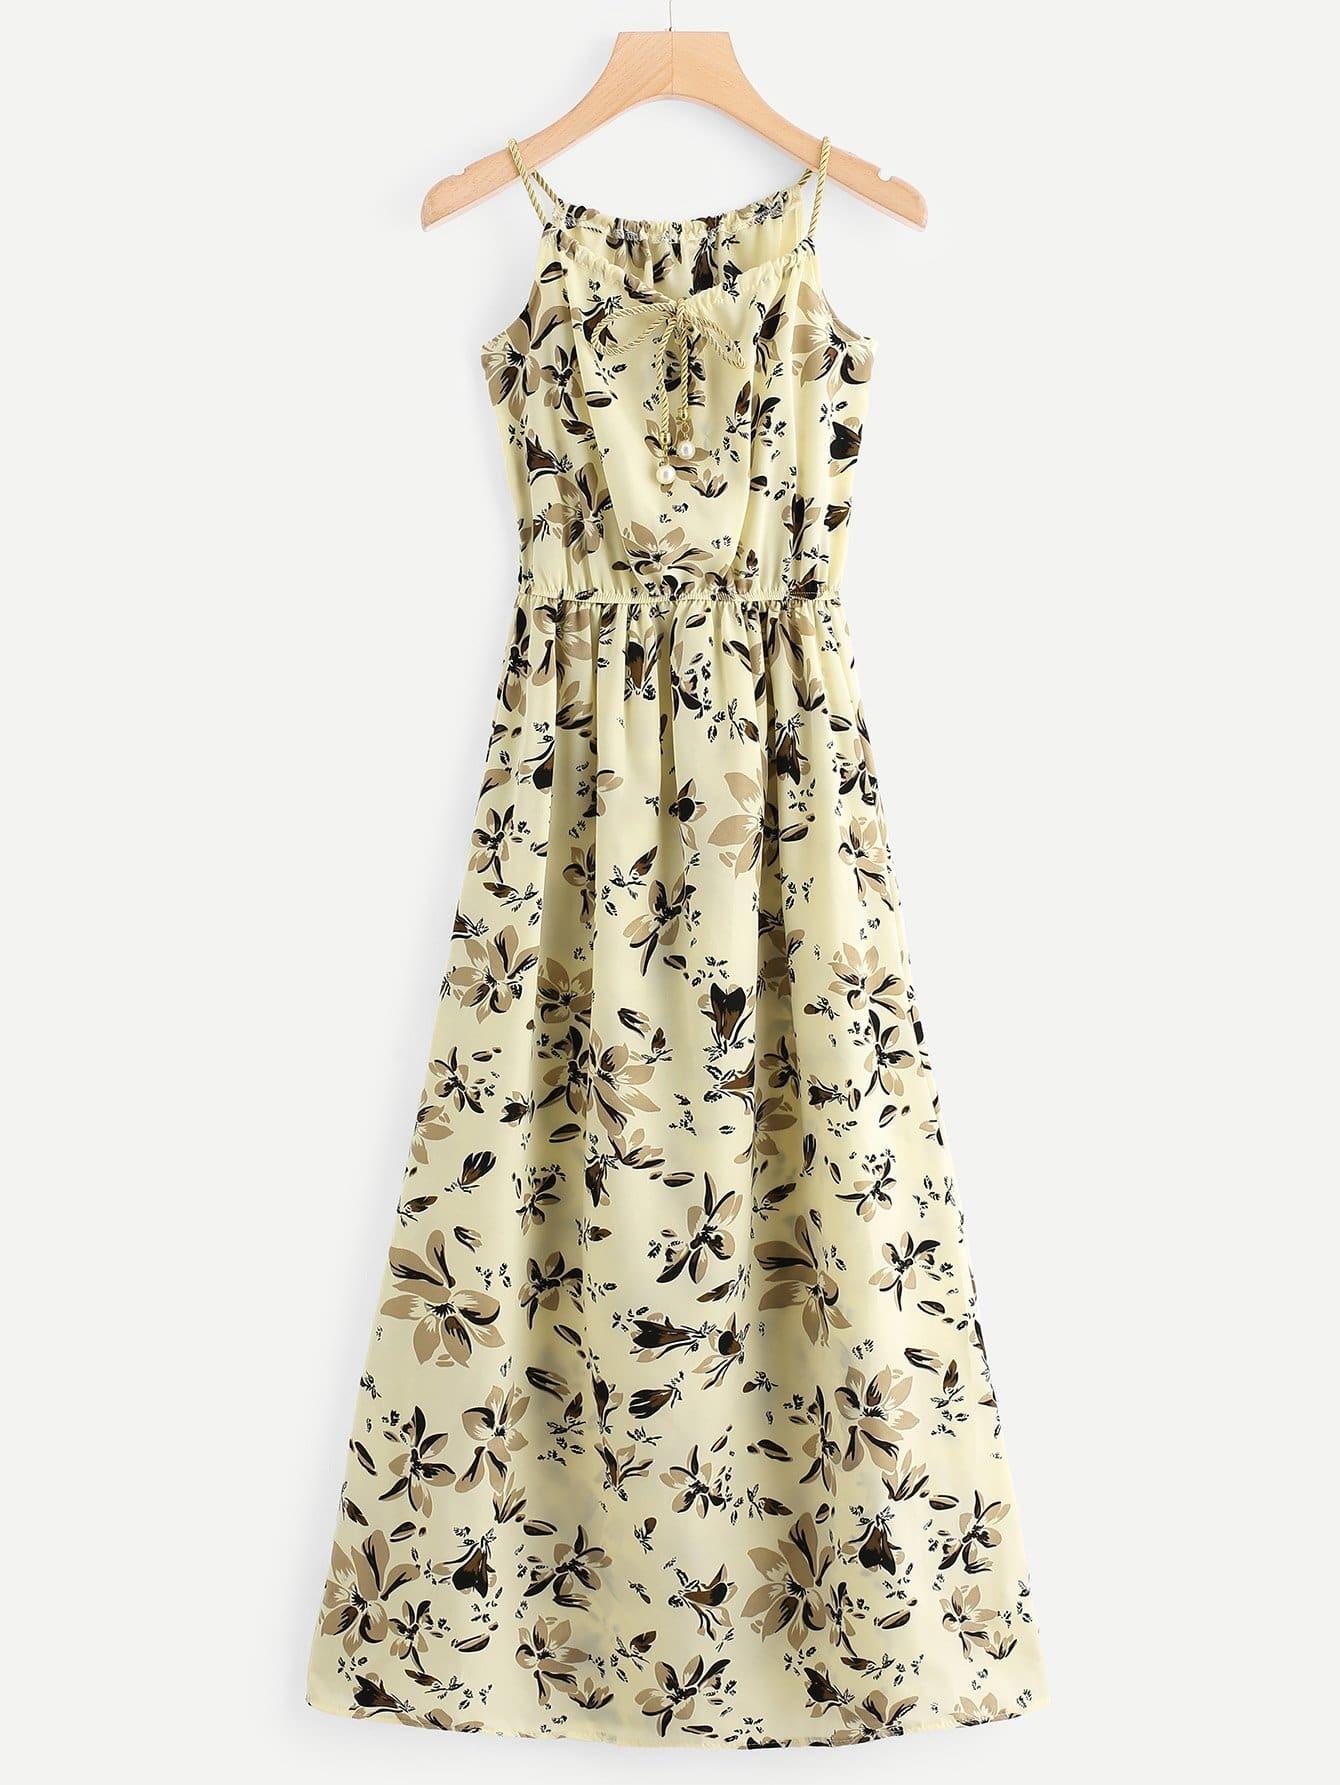 Floral Print Faux Pearl Detail Cami Dress